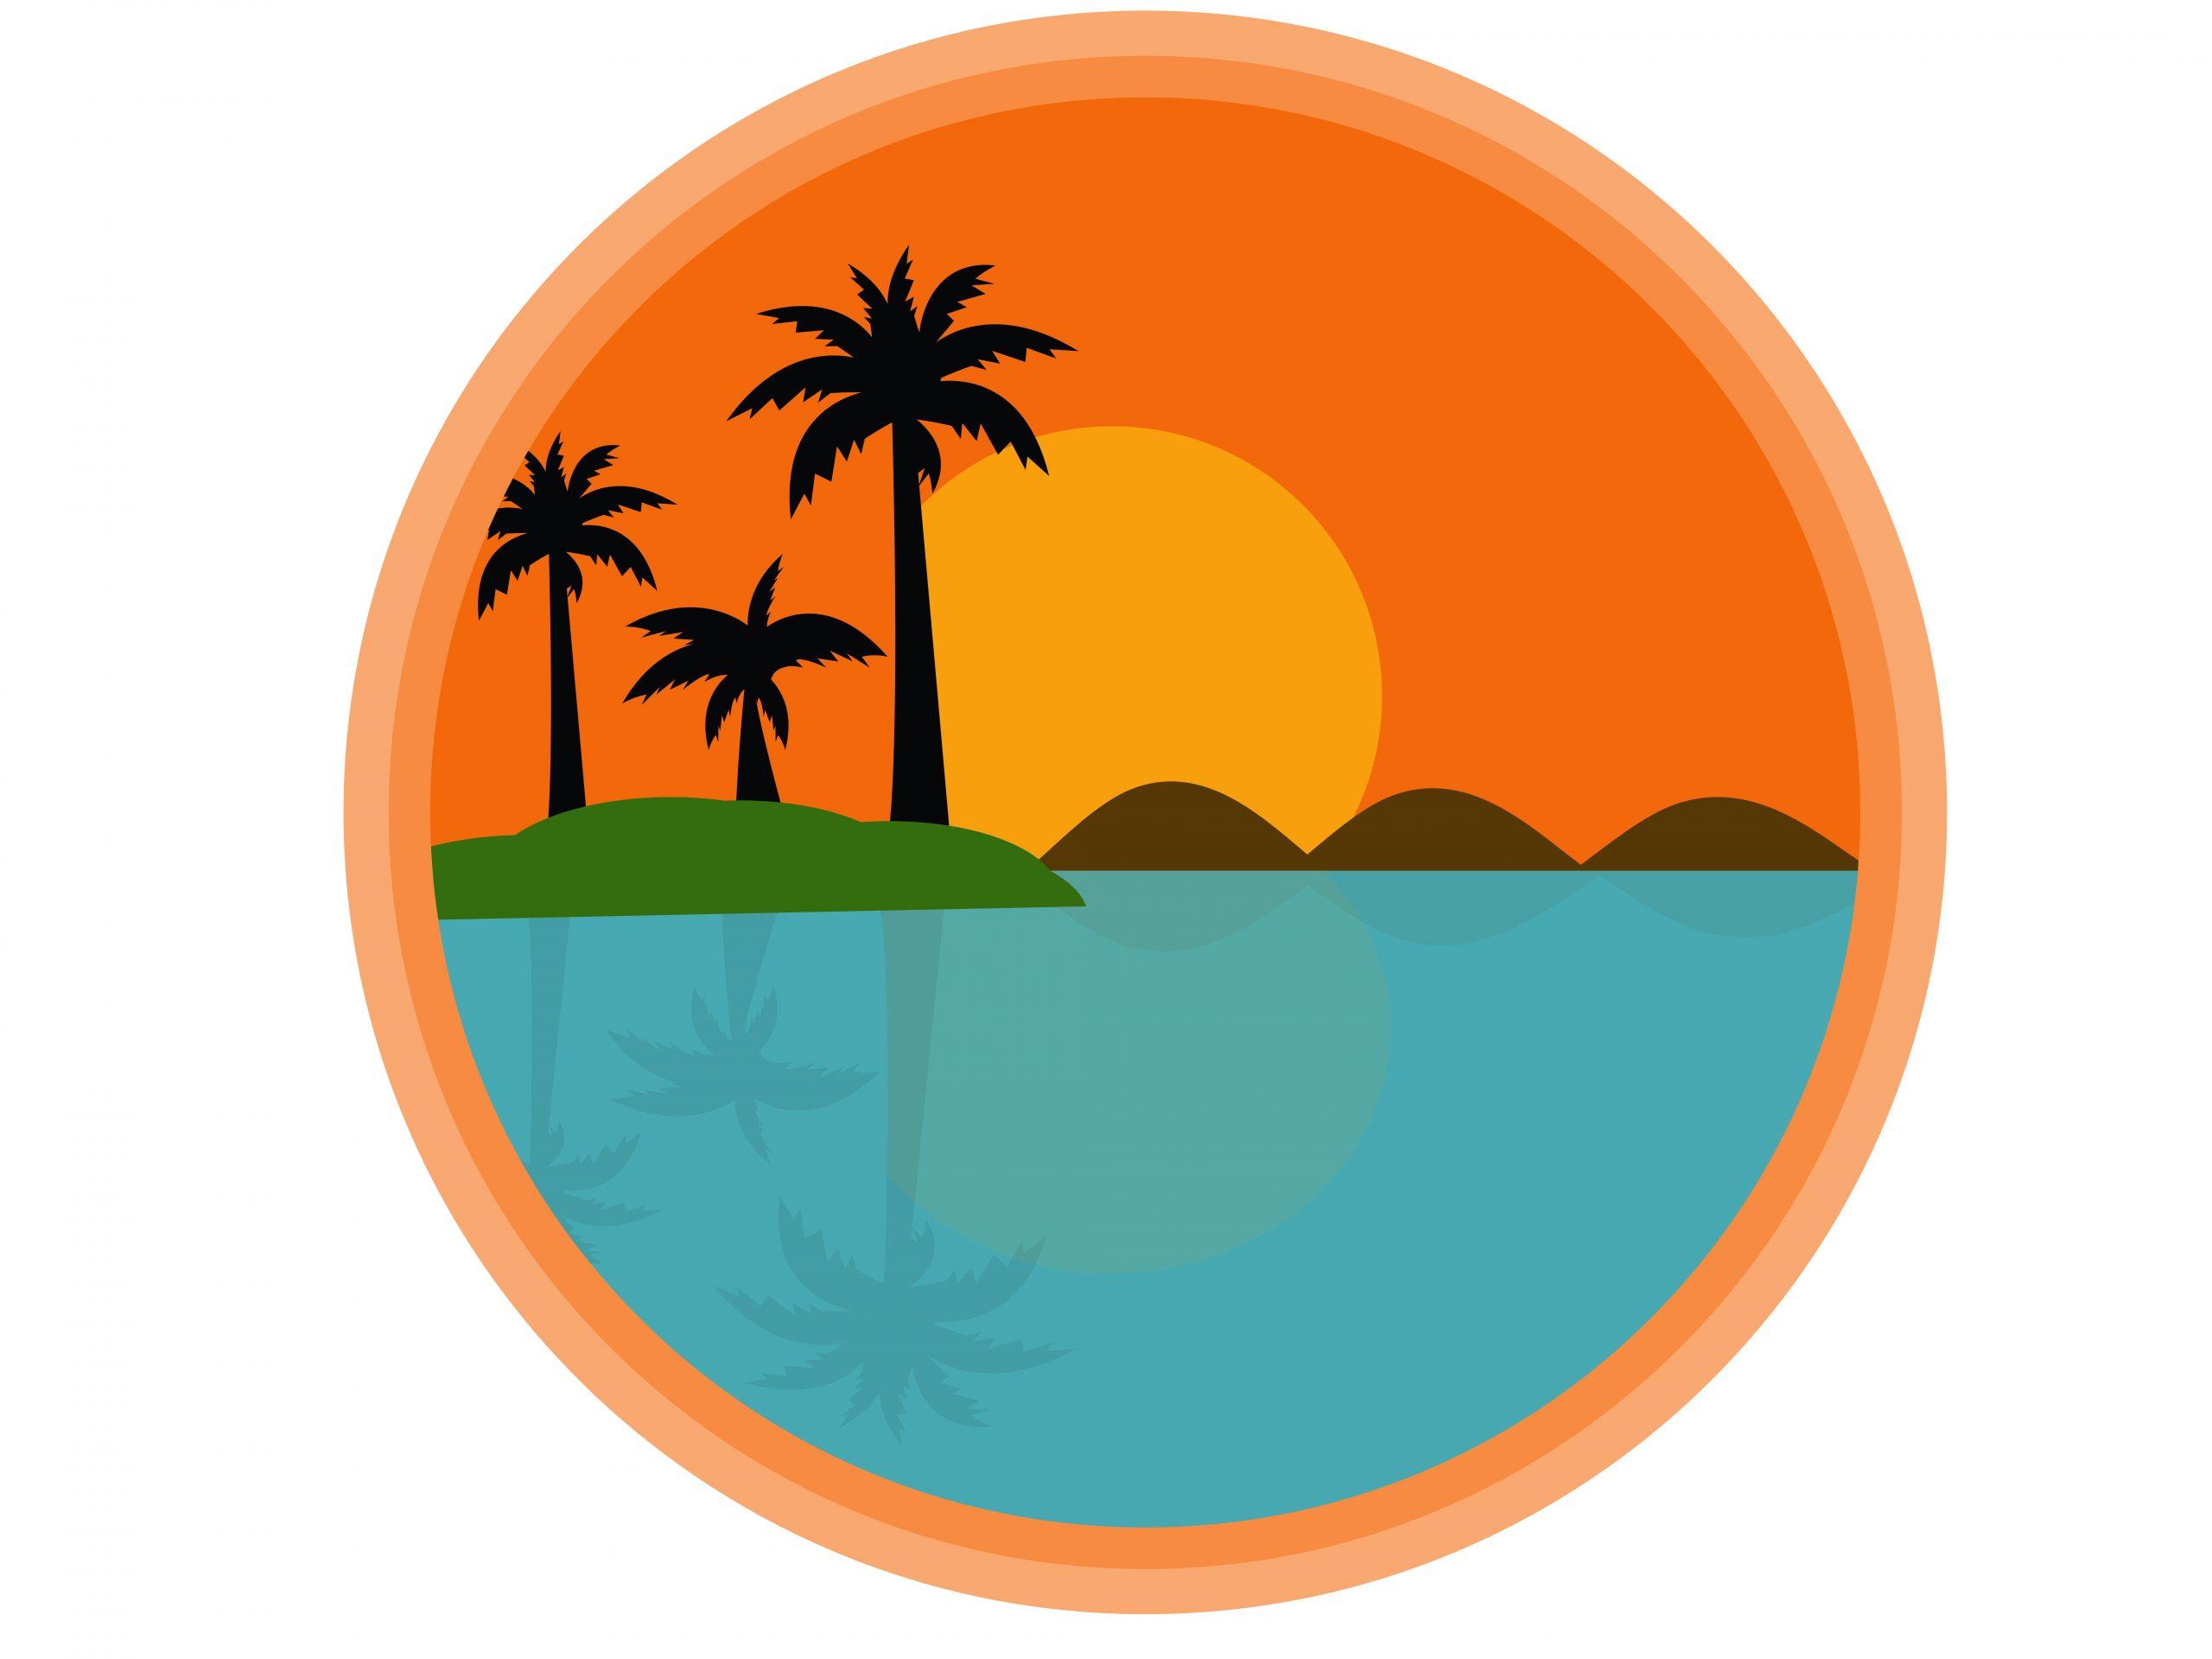 coconut-tree-illustration